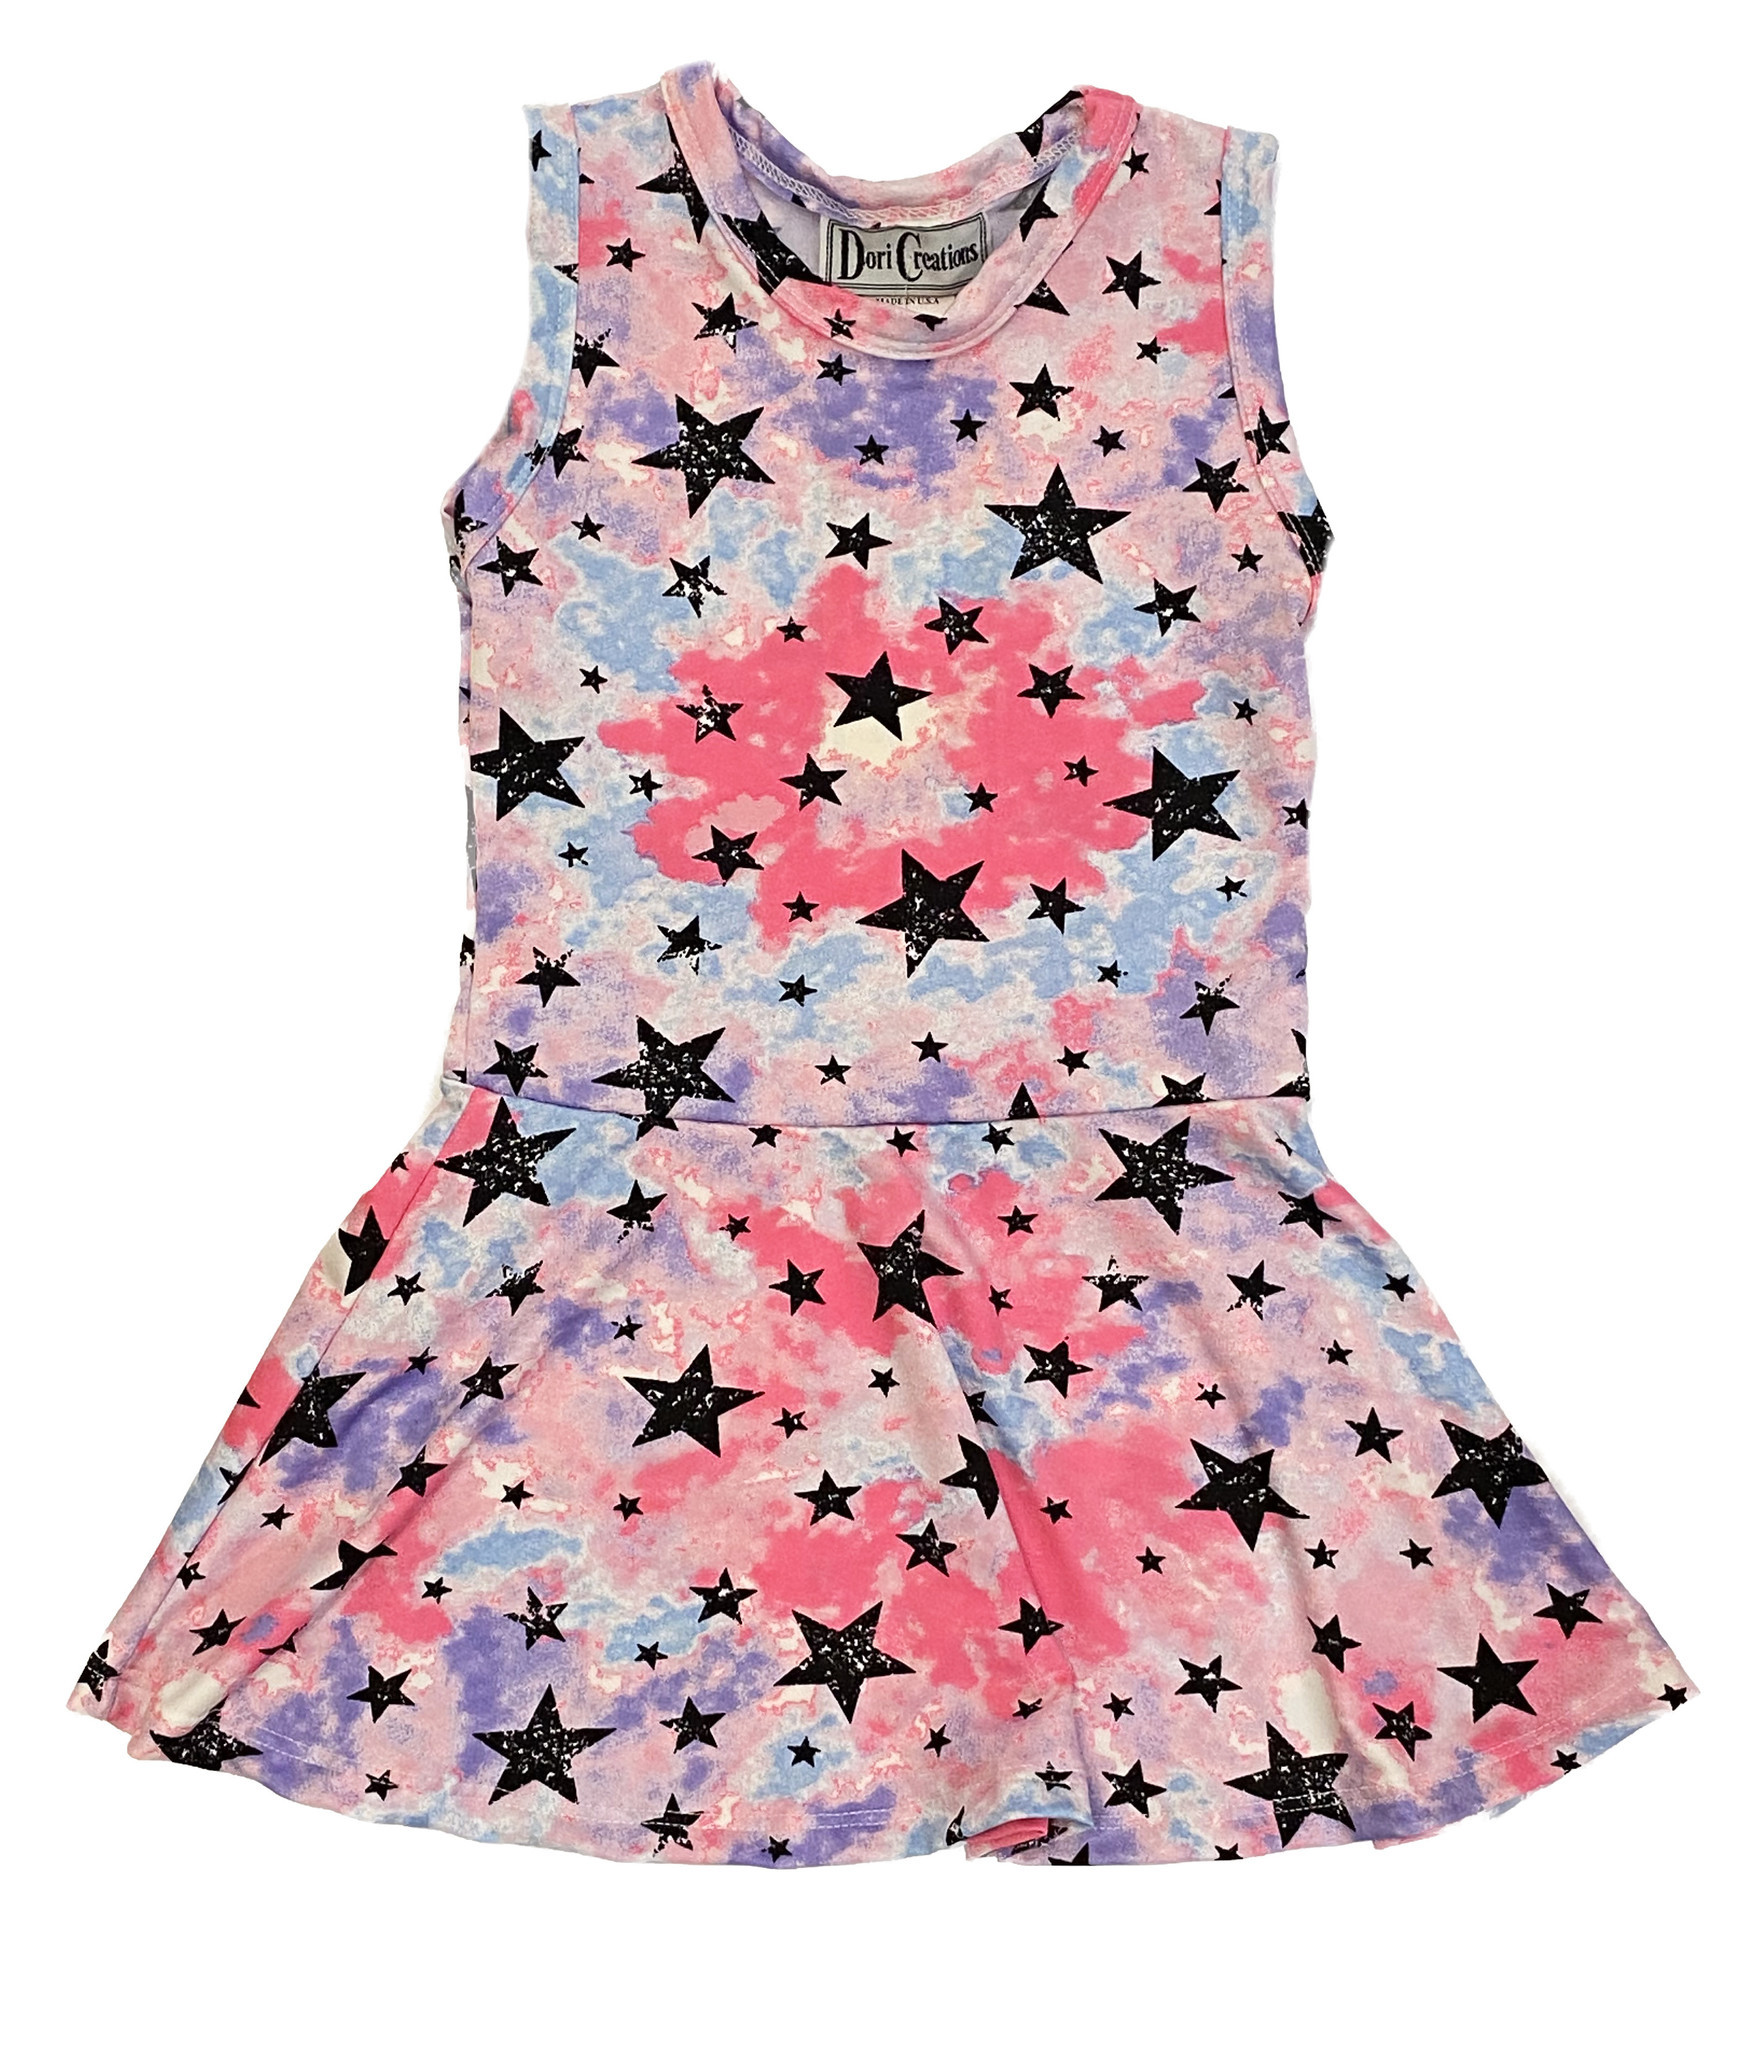 Dori Neon Stars Dress